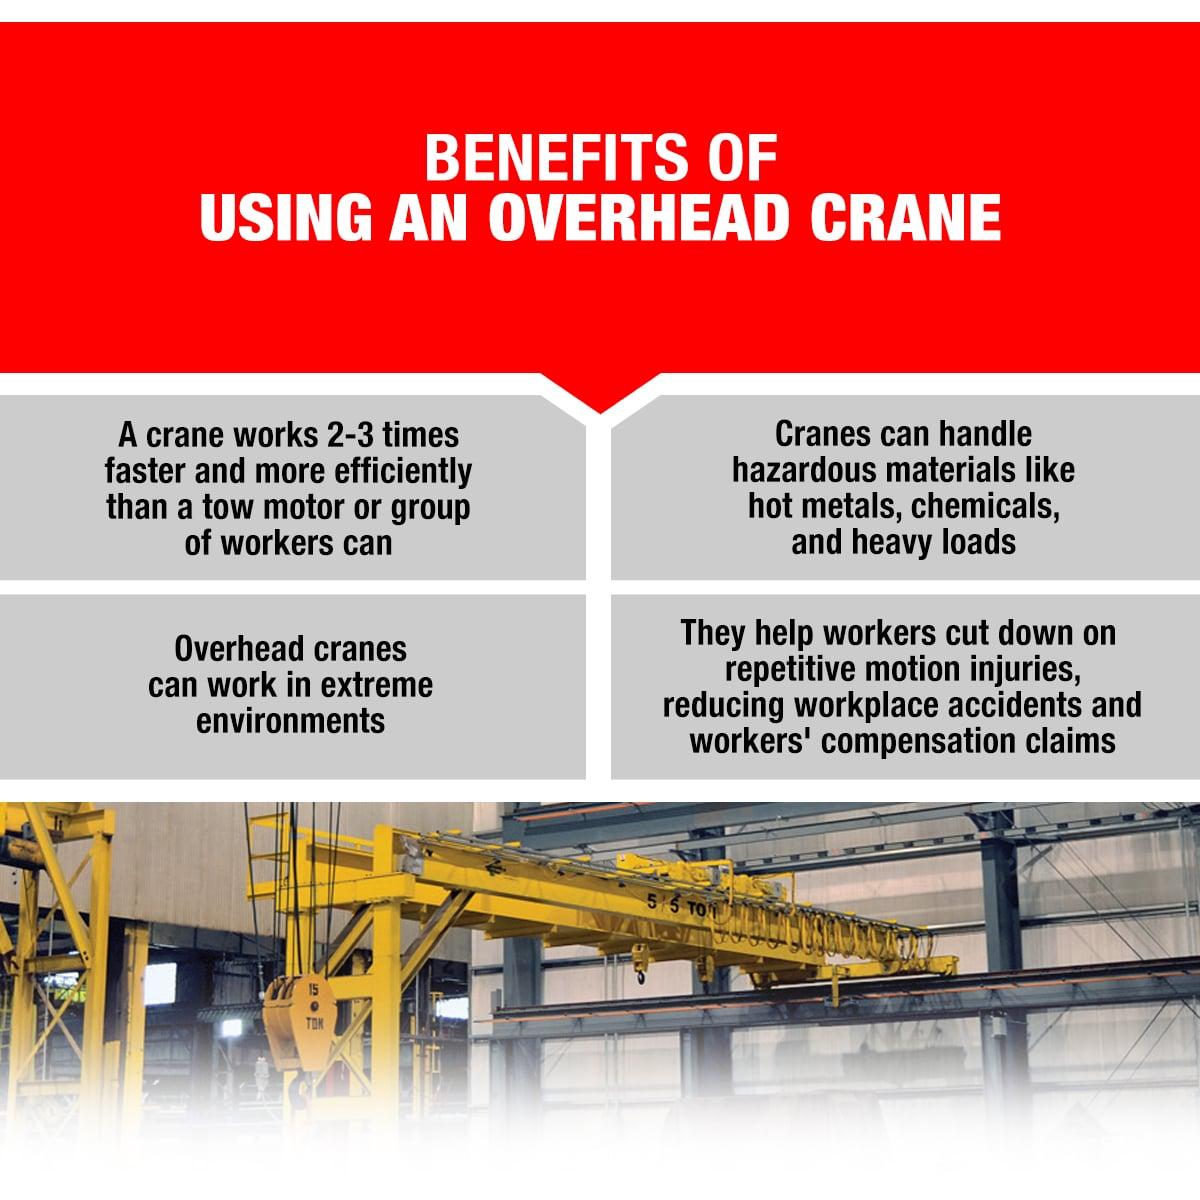 Benefits of Using an Overhead Crane